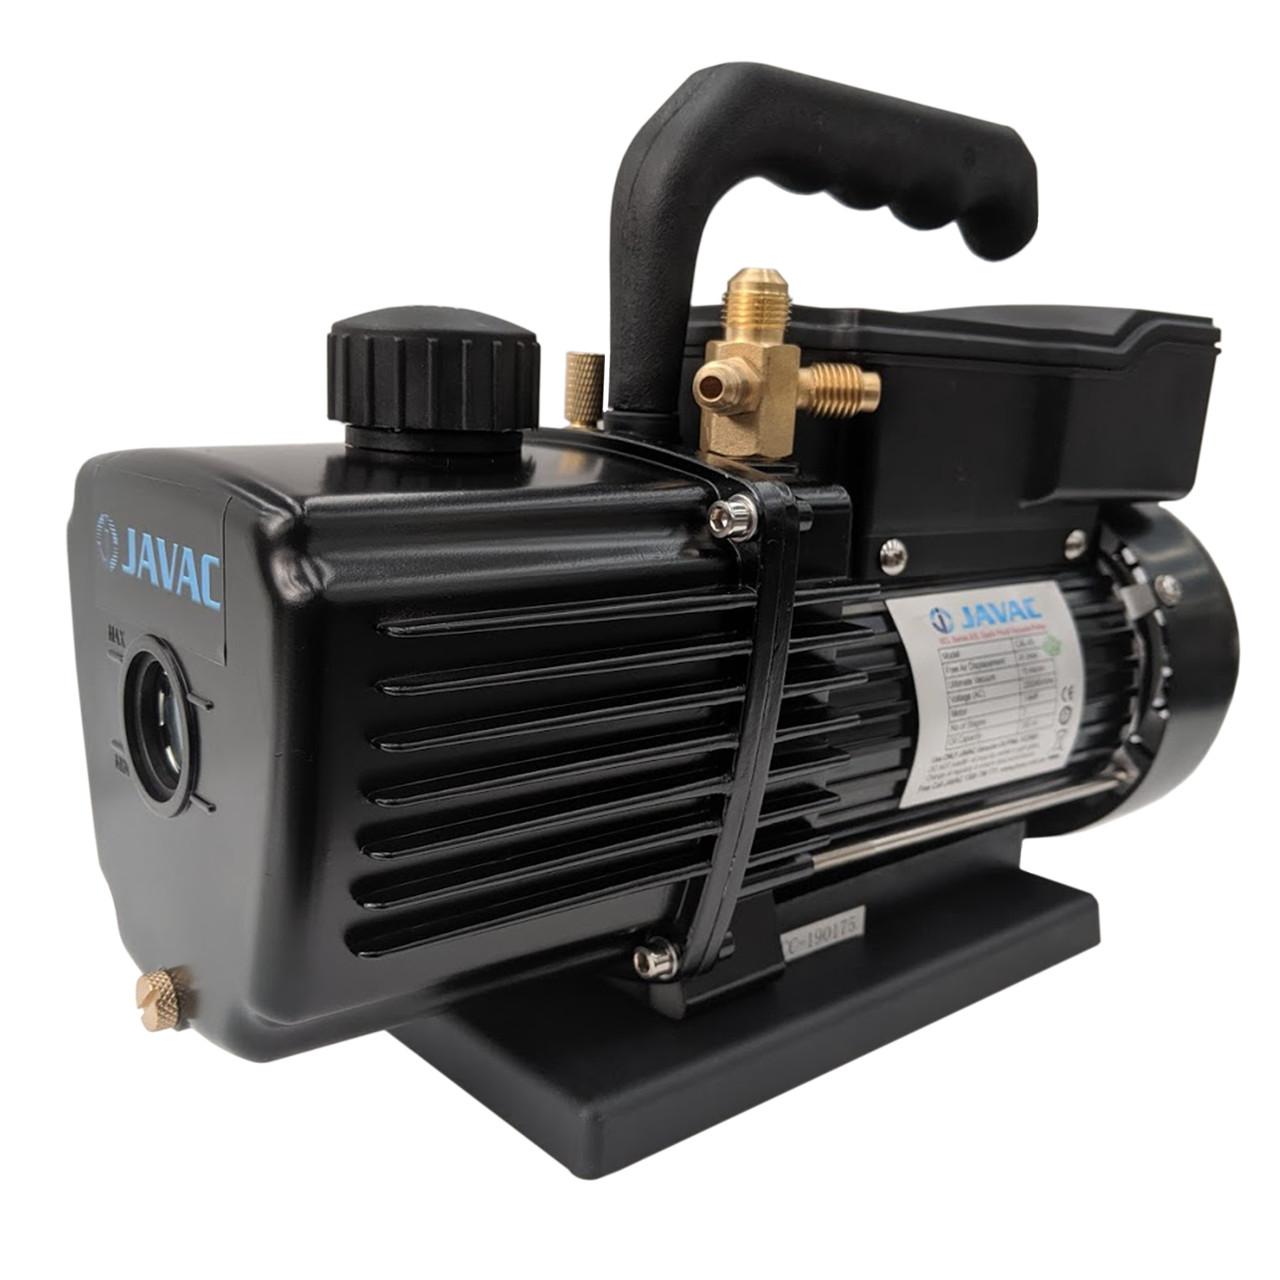 Javac 81L Vacuum Pump - R32 Compliant